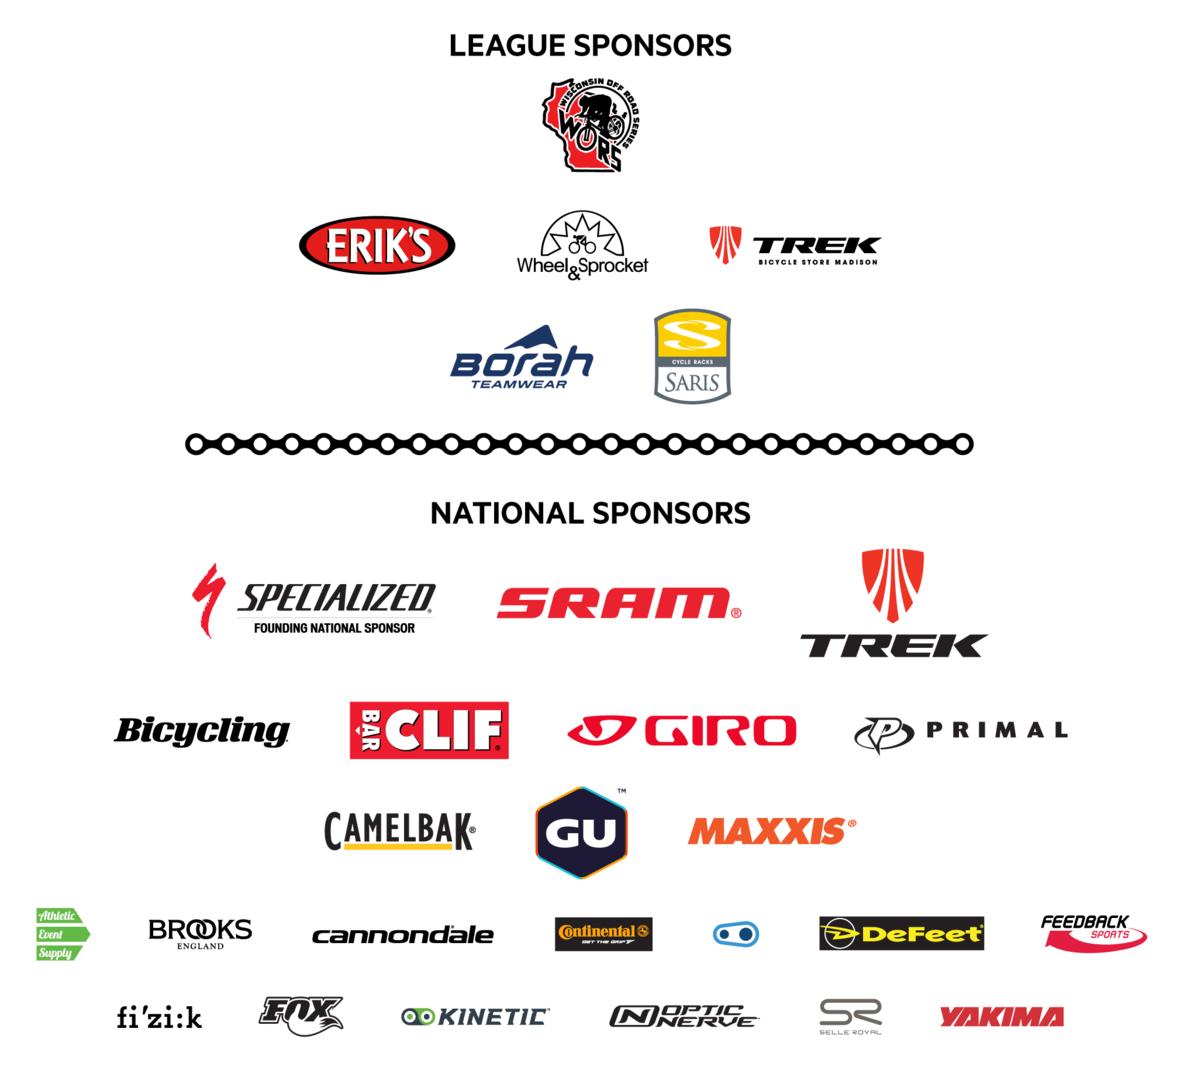 WI-sponsors 7.28.15